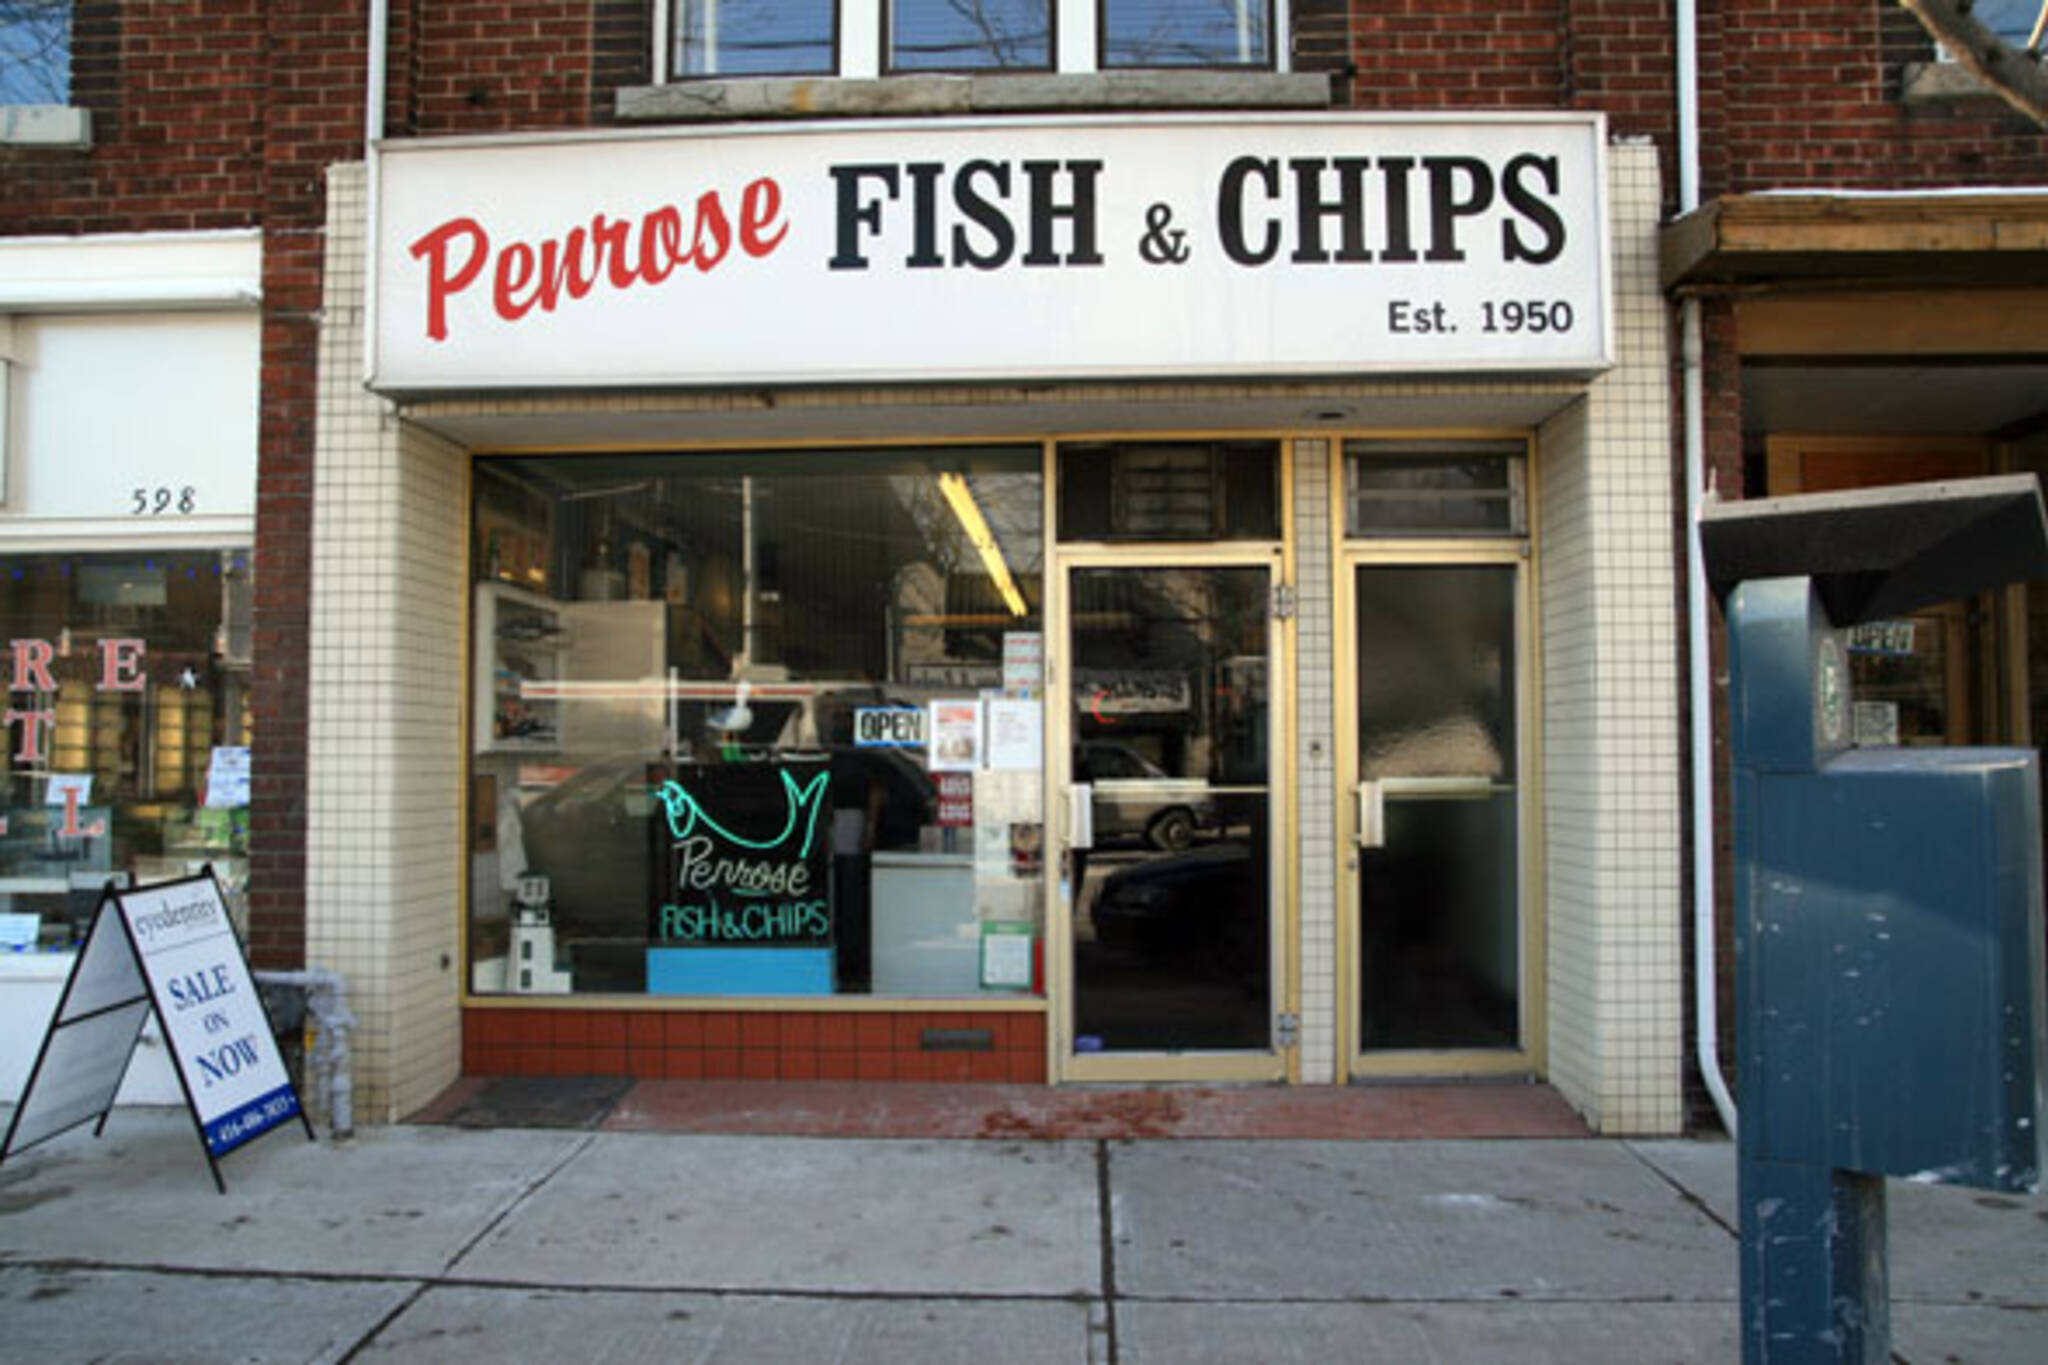 penrose fish chips